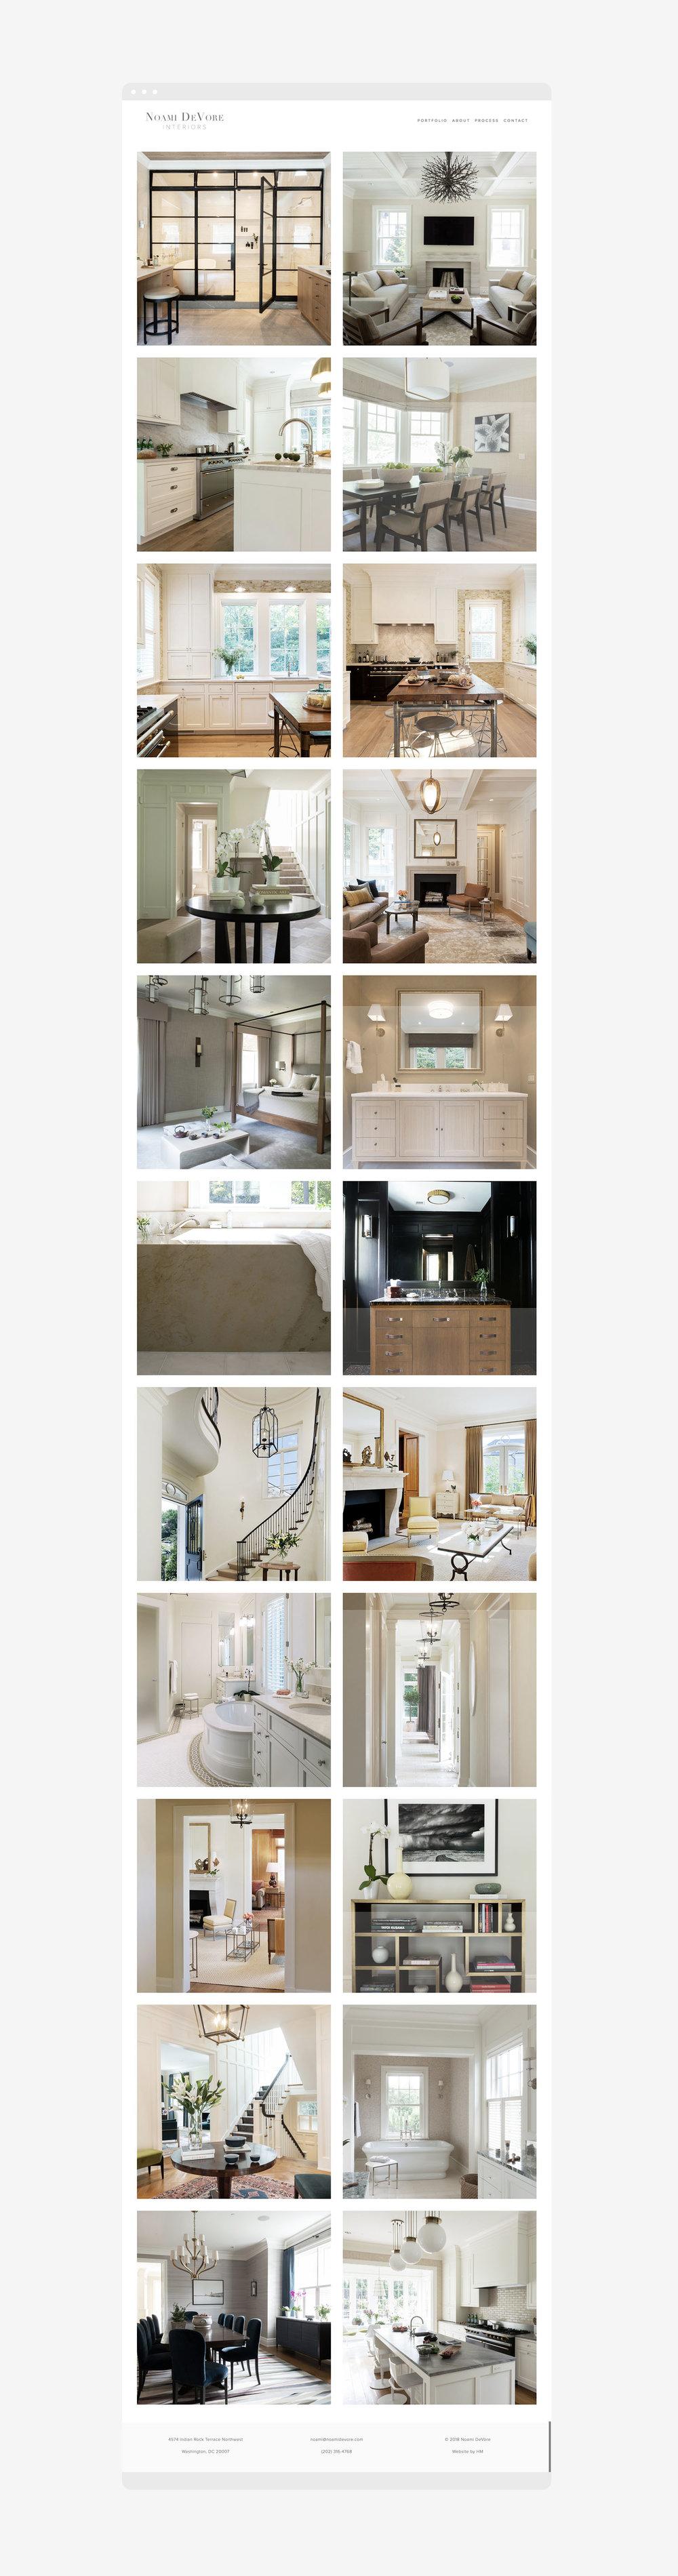 Heather_Maehr_Graphic_Website_Squarespace_Designer_Portland_Oregon_Noami_DeVore_Interiors.jpg